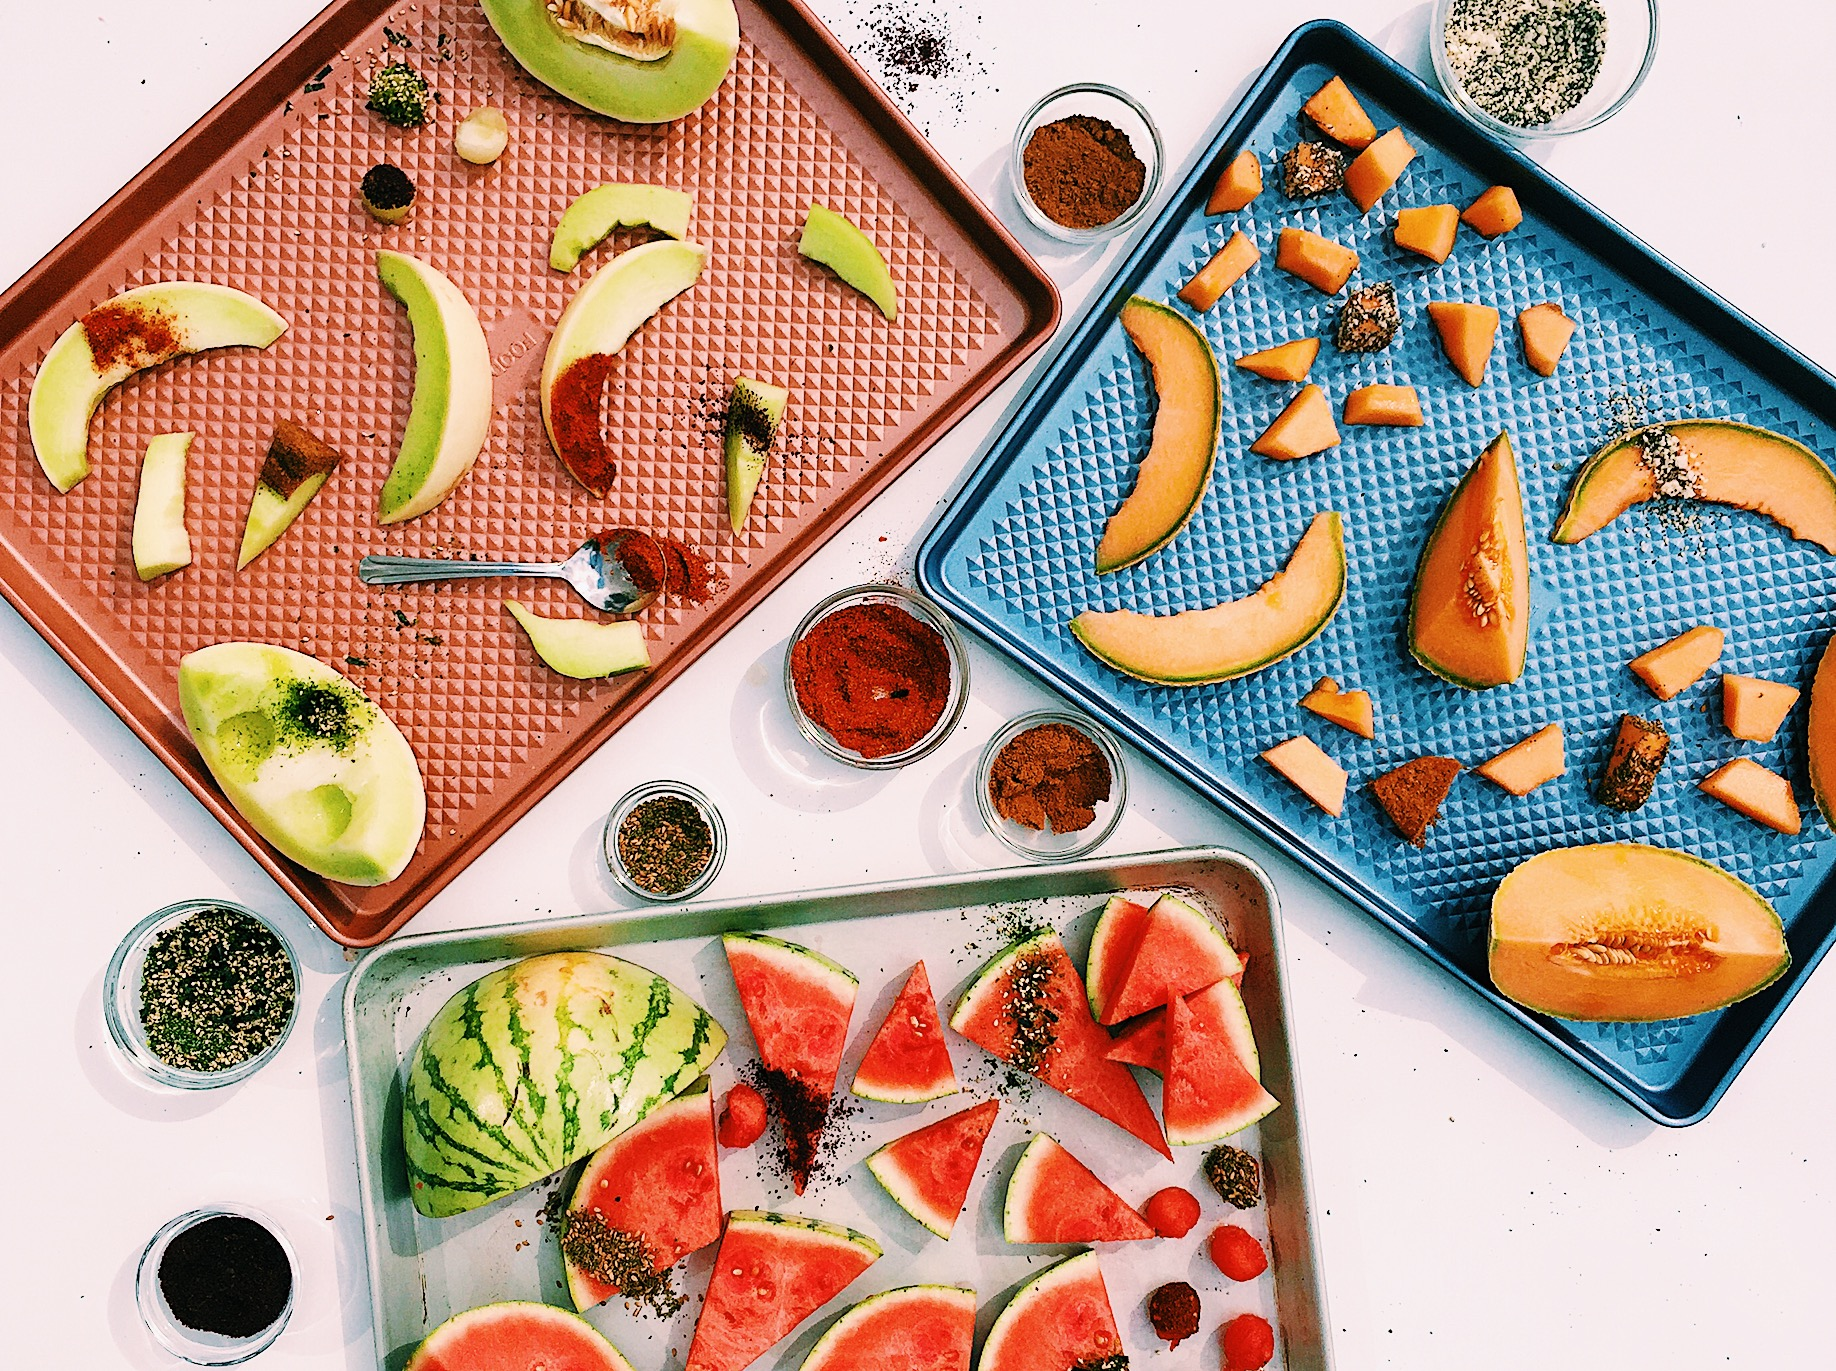 fruitspice8.jpeg